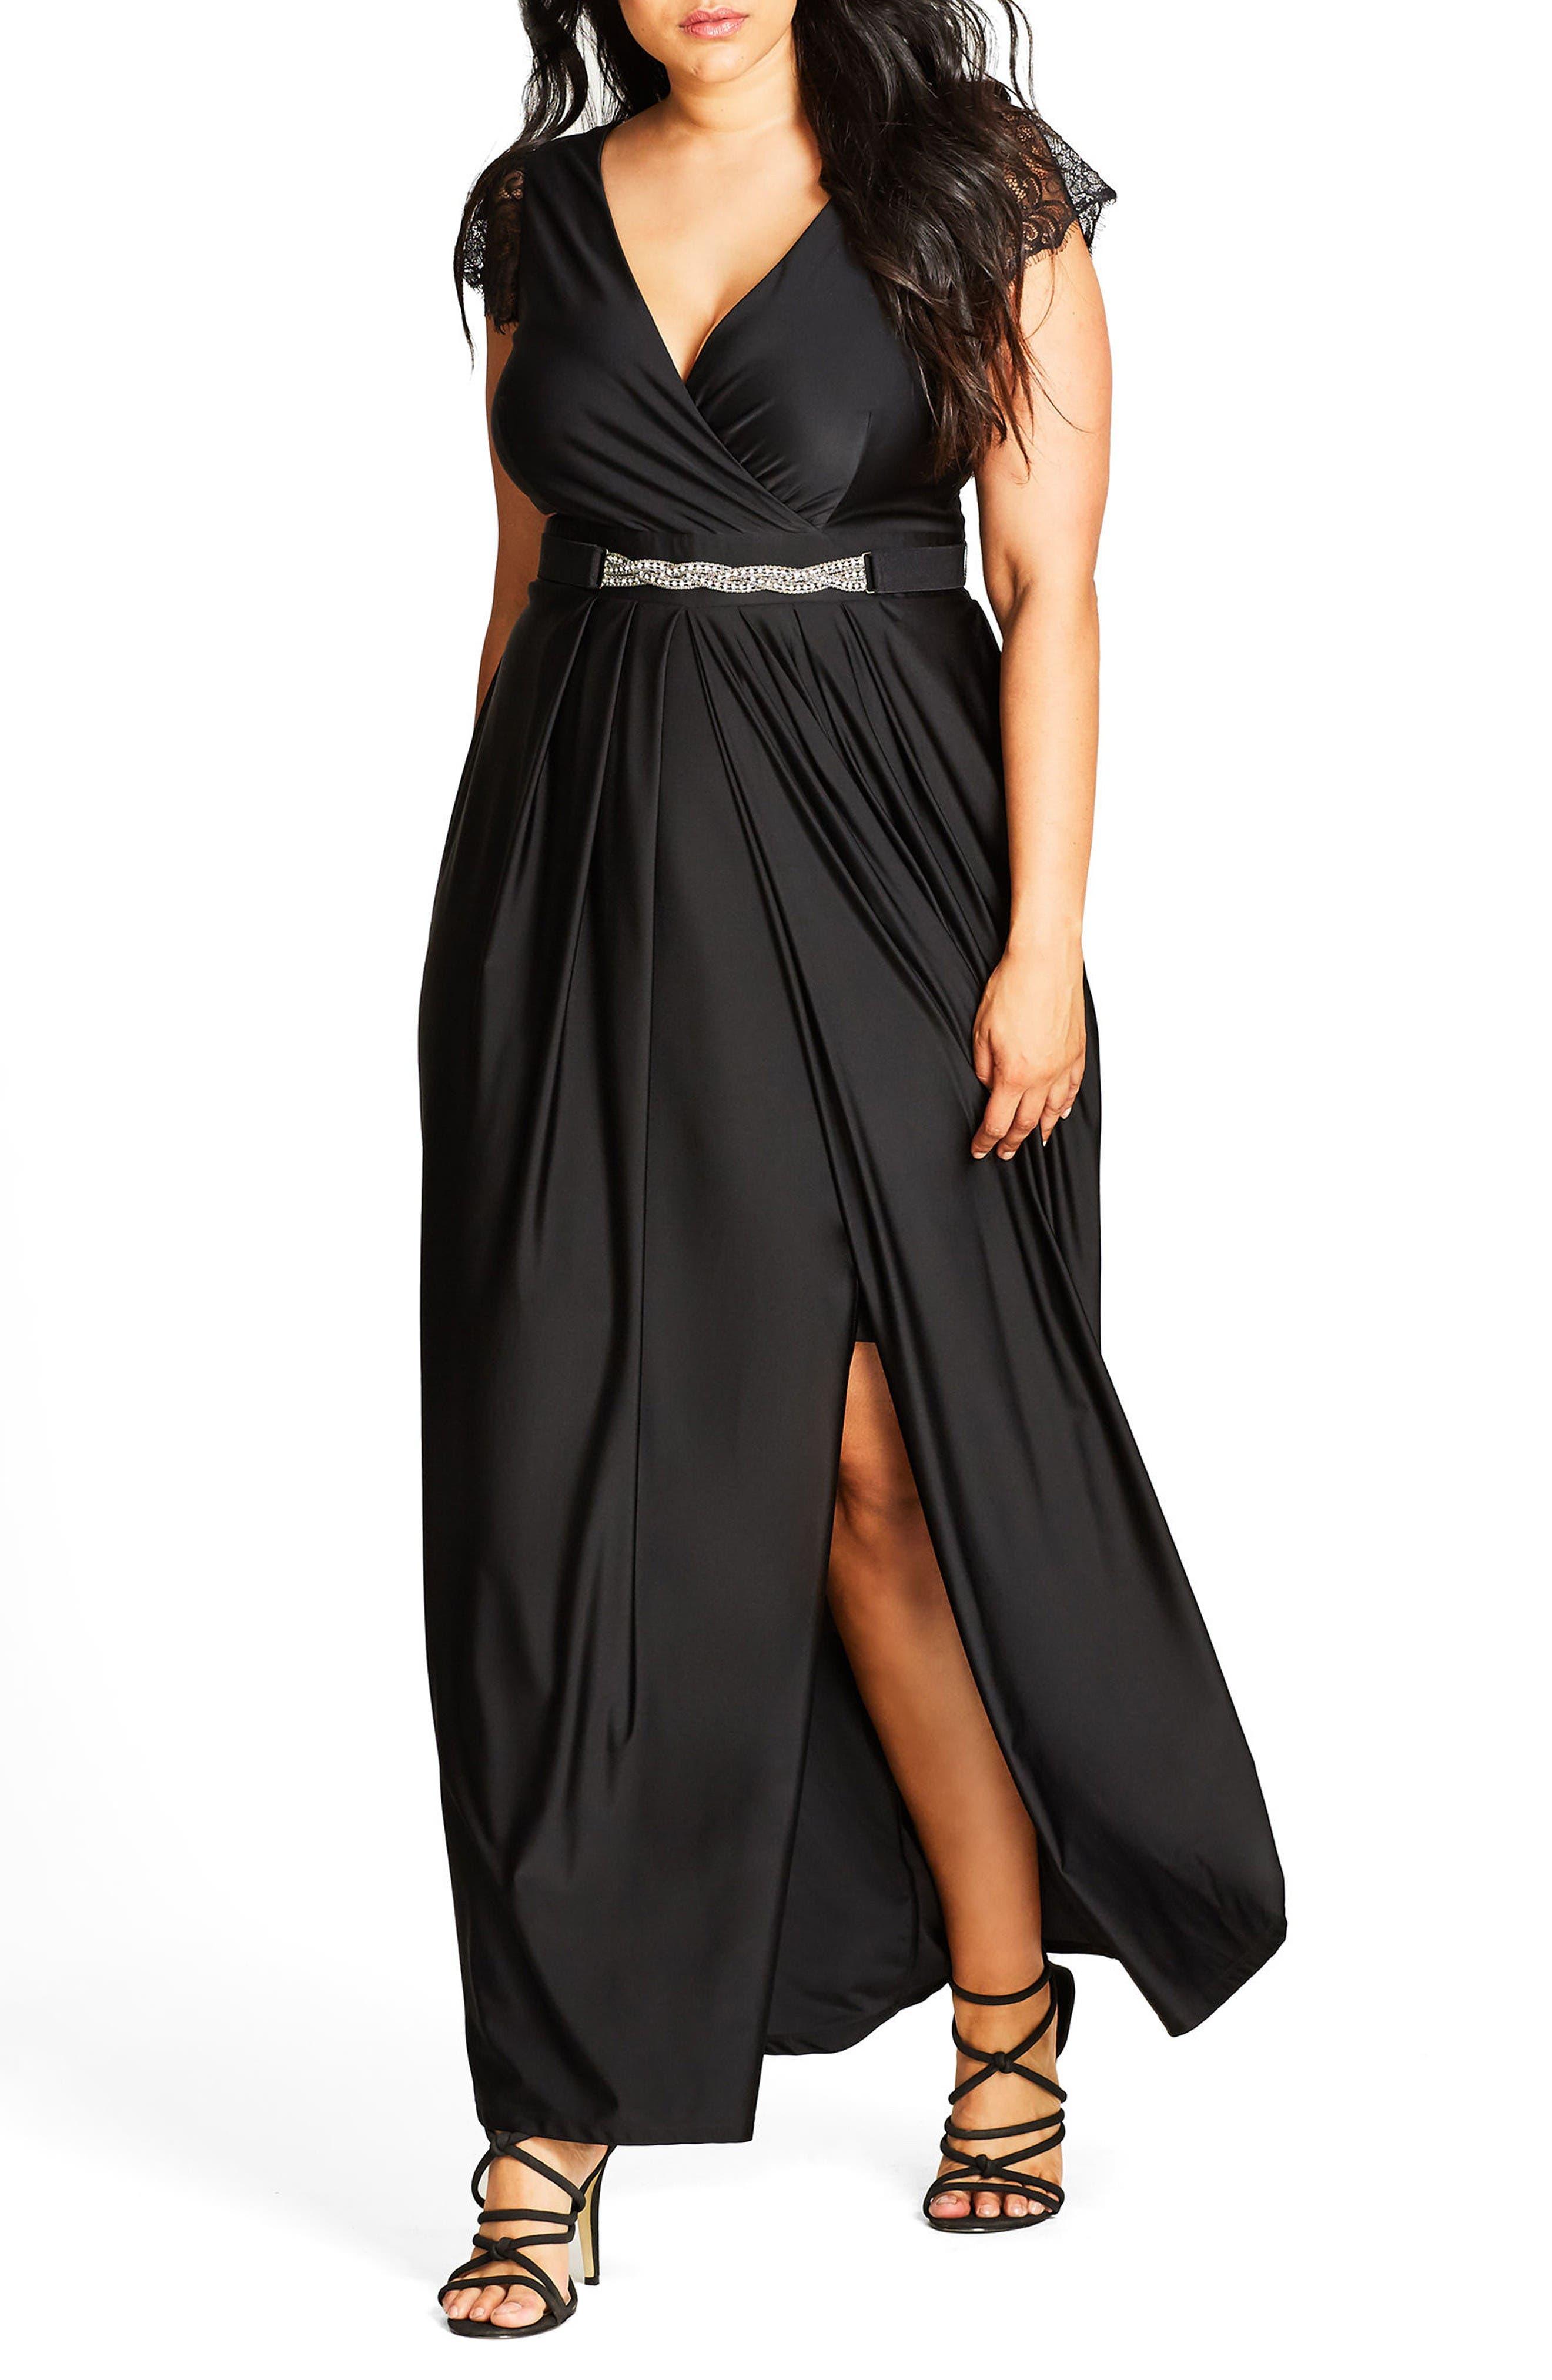 Main Image - City Chic Flirty Drape Maxi Dress (Plus Size)